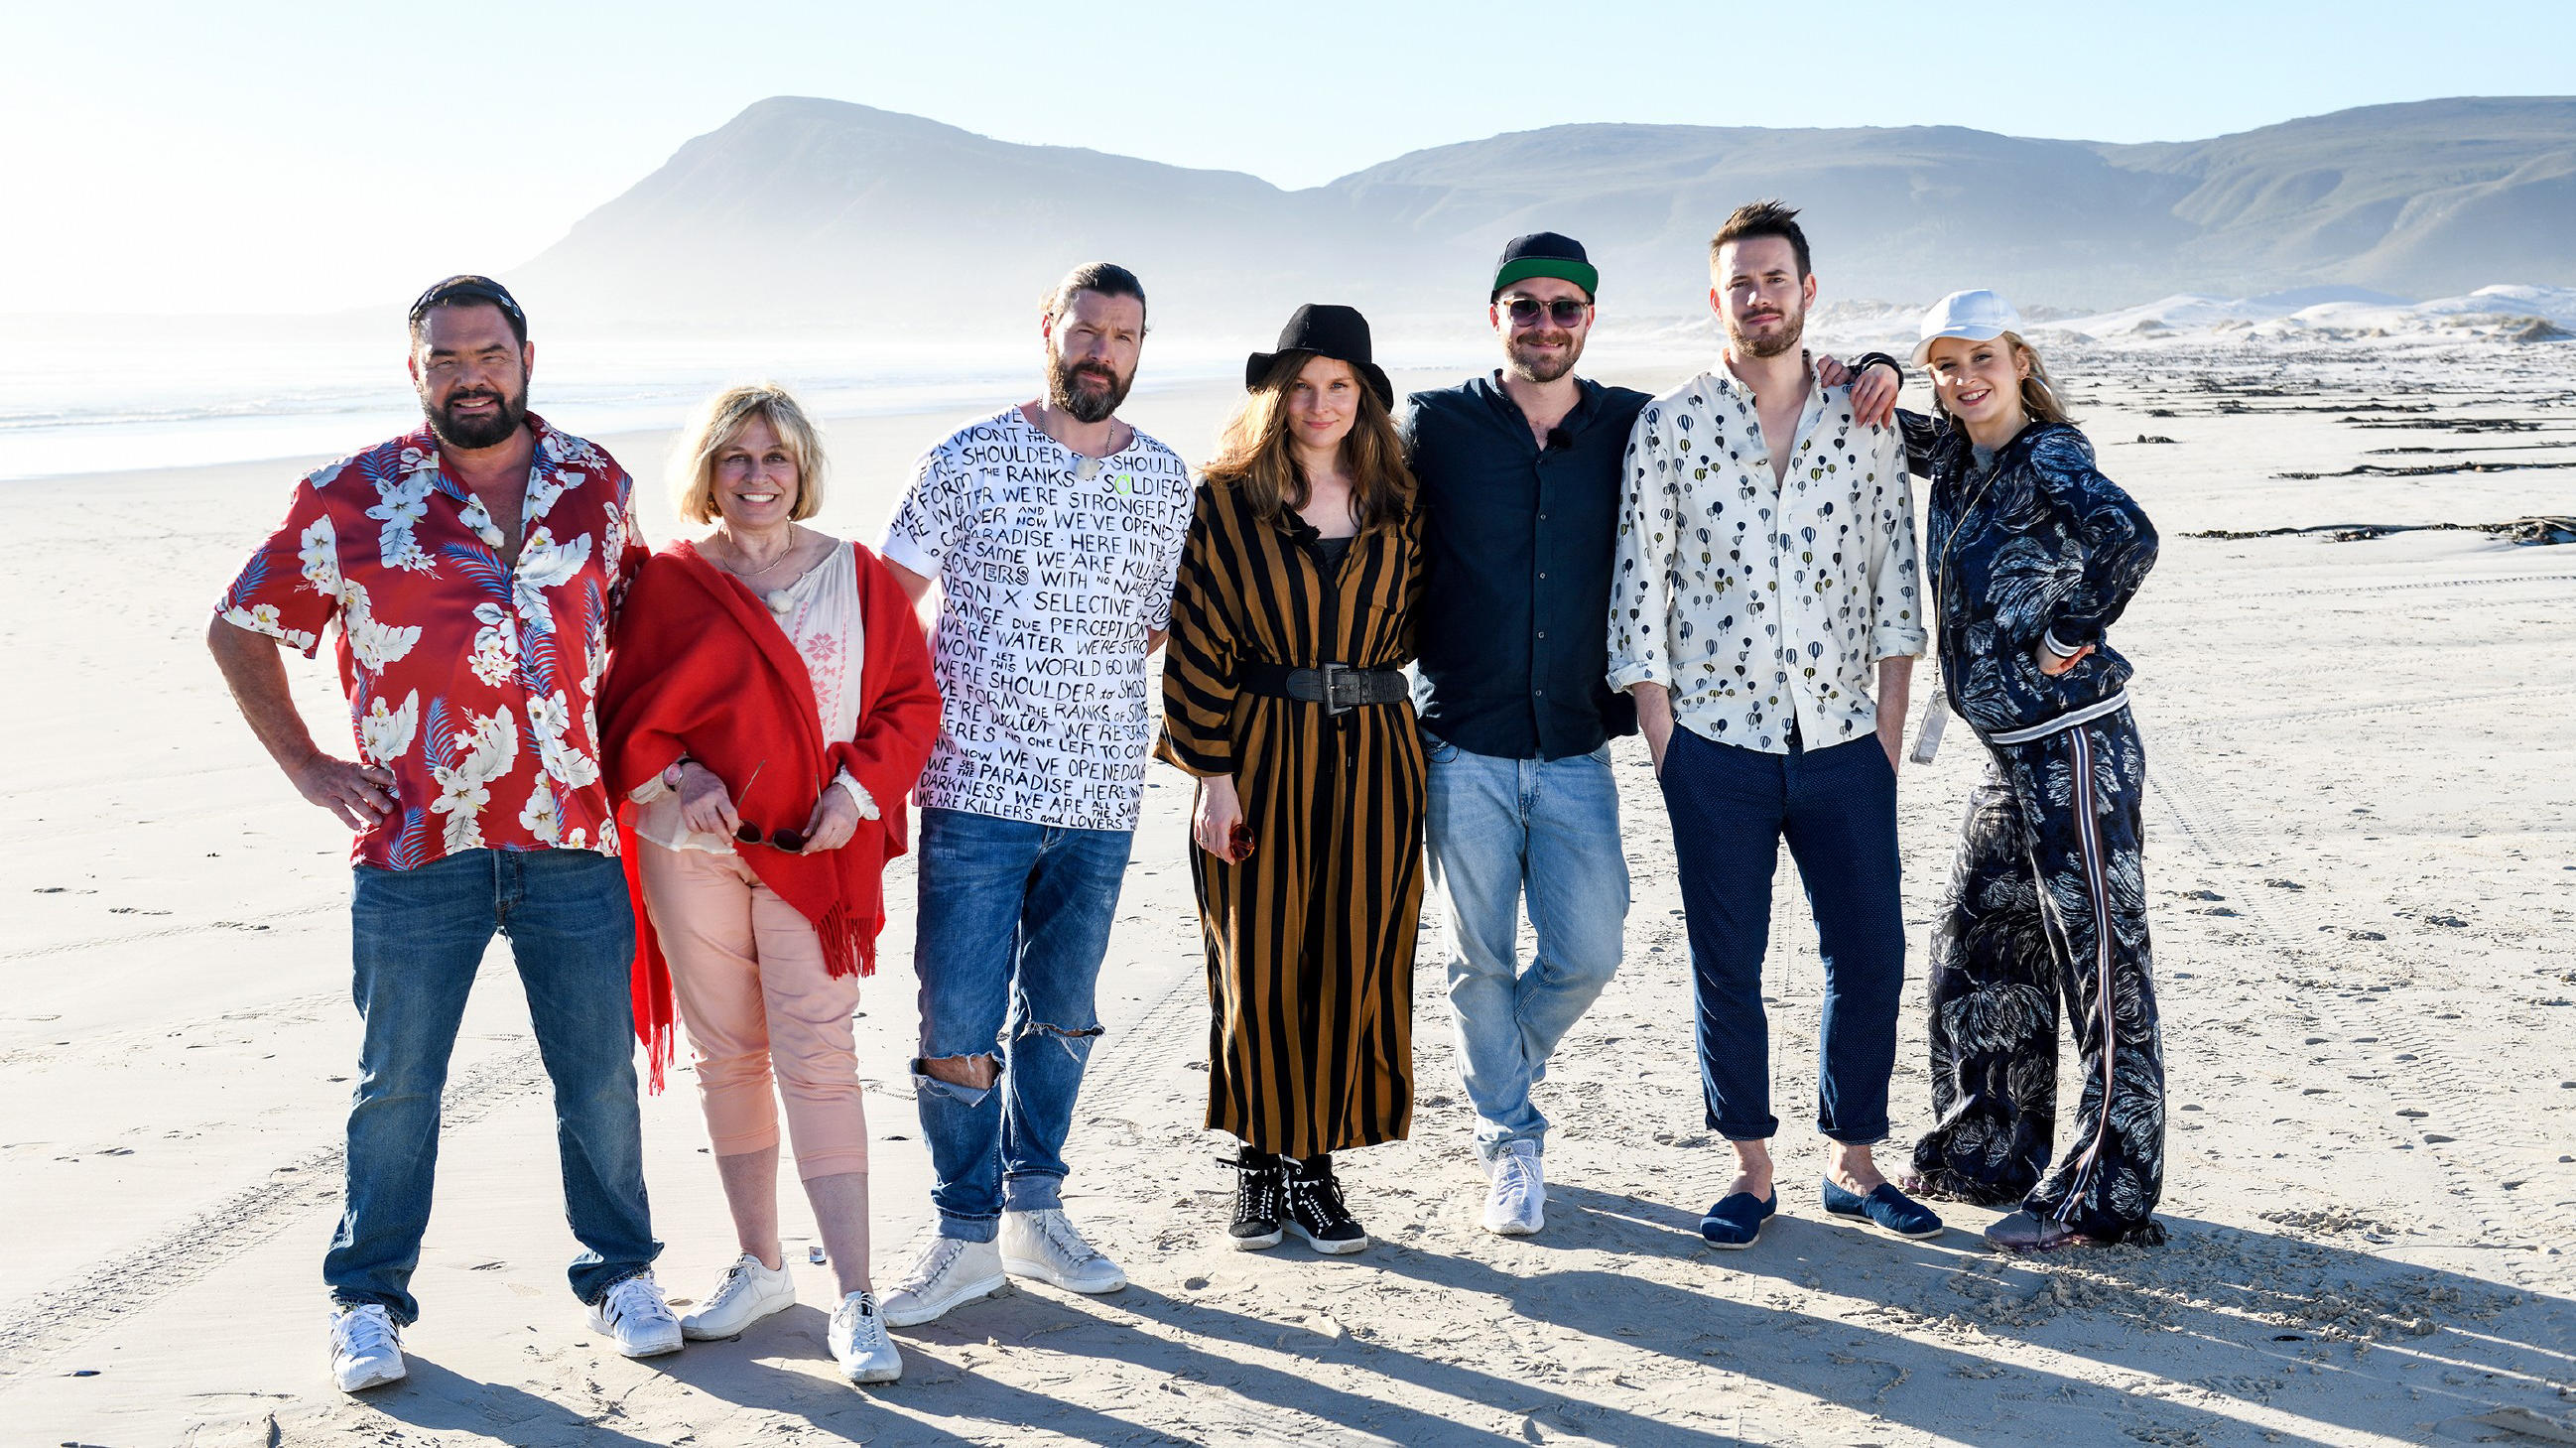 Sing meinen Song - Das Tauschkonzert 2018 bei TV NOW